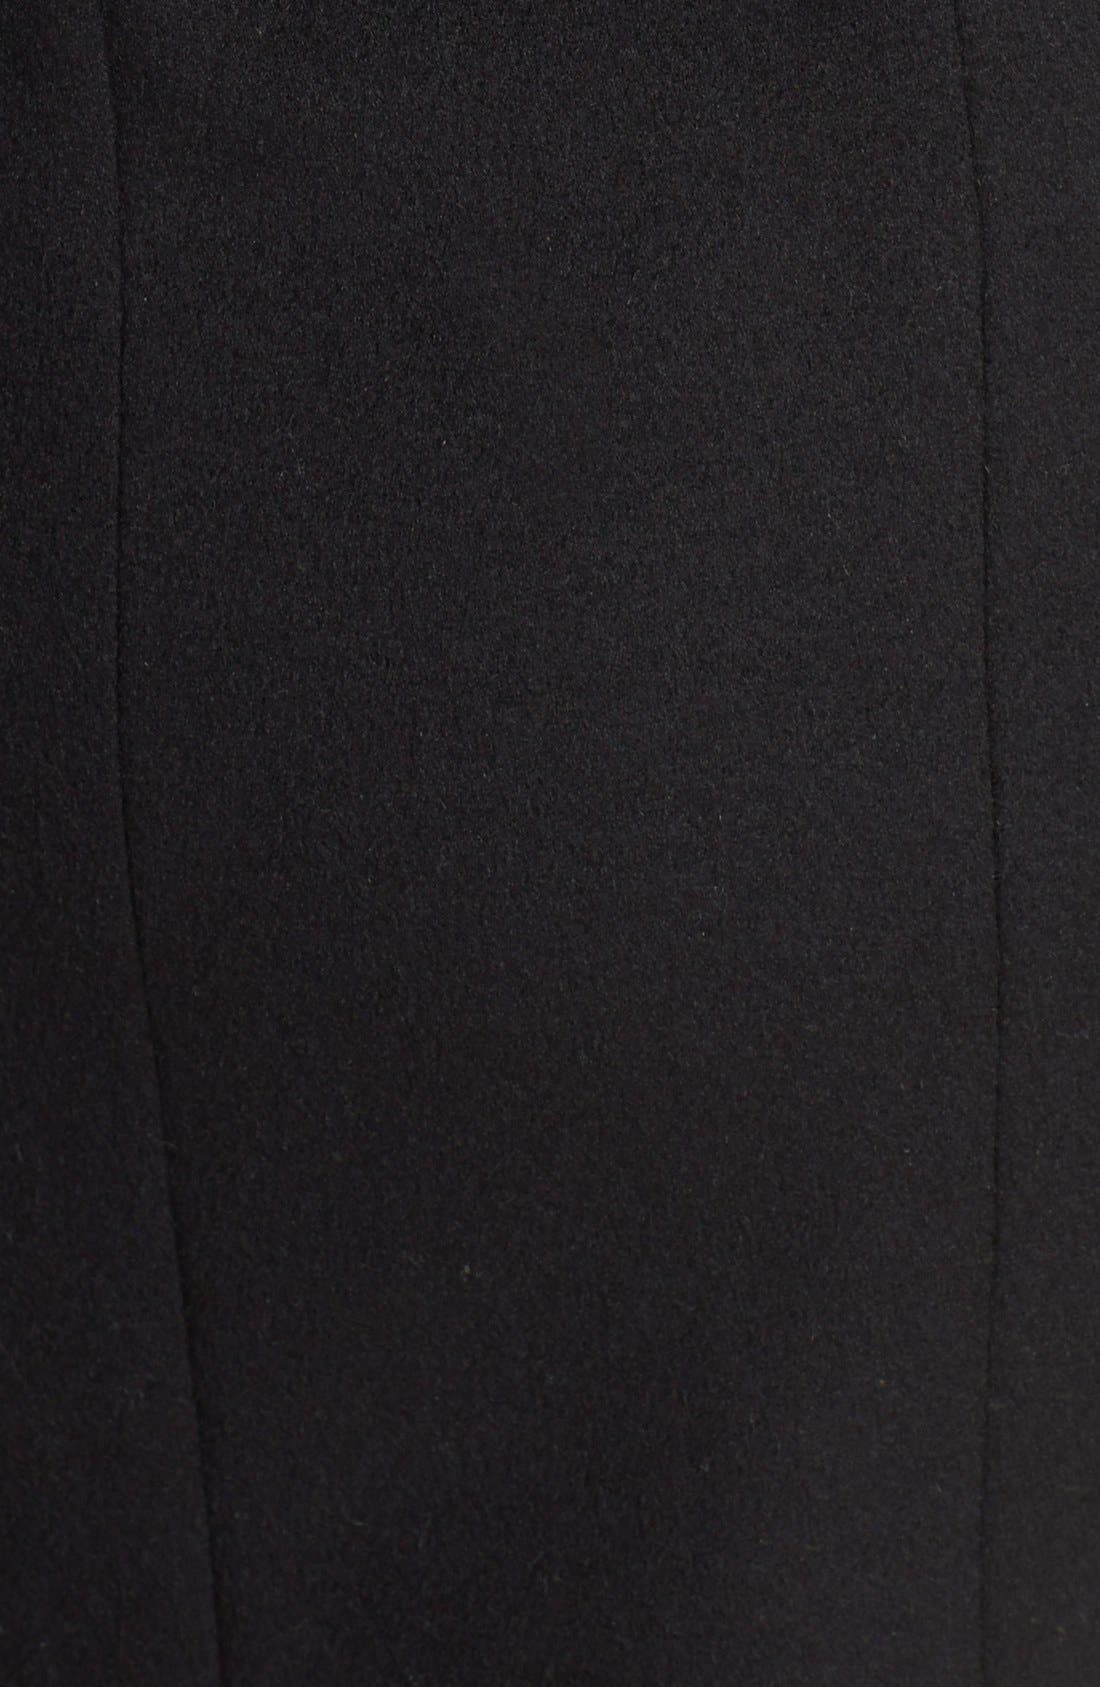 Removable Hood Wool Blend Duffle Coat,                             Alternate thumbnail 3, color,                             001